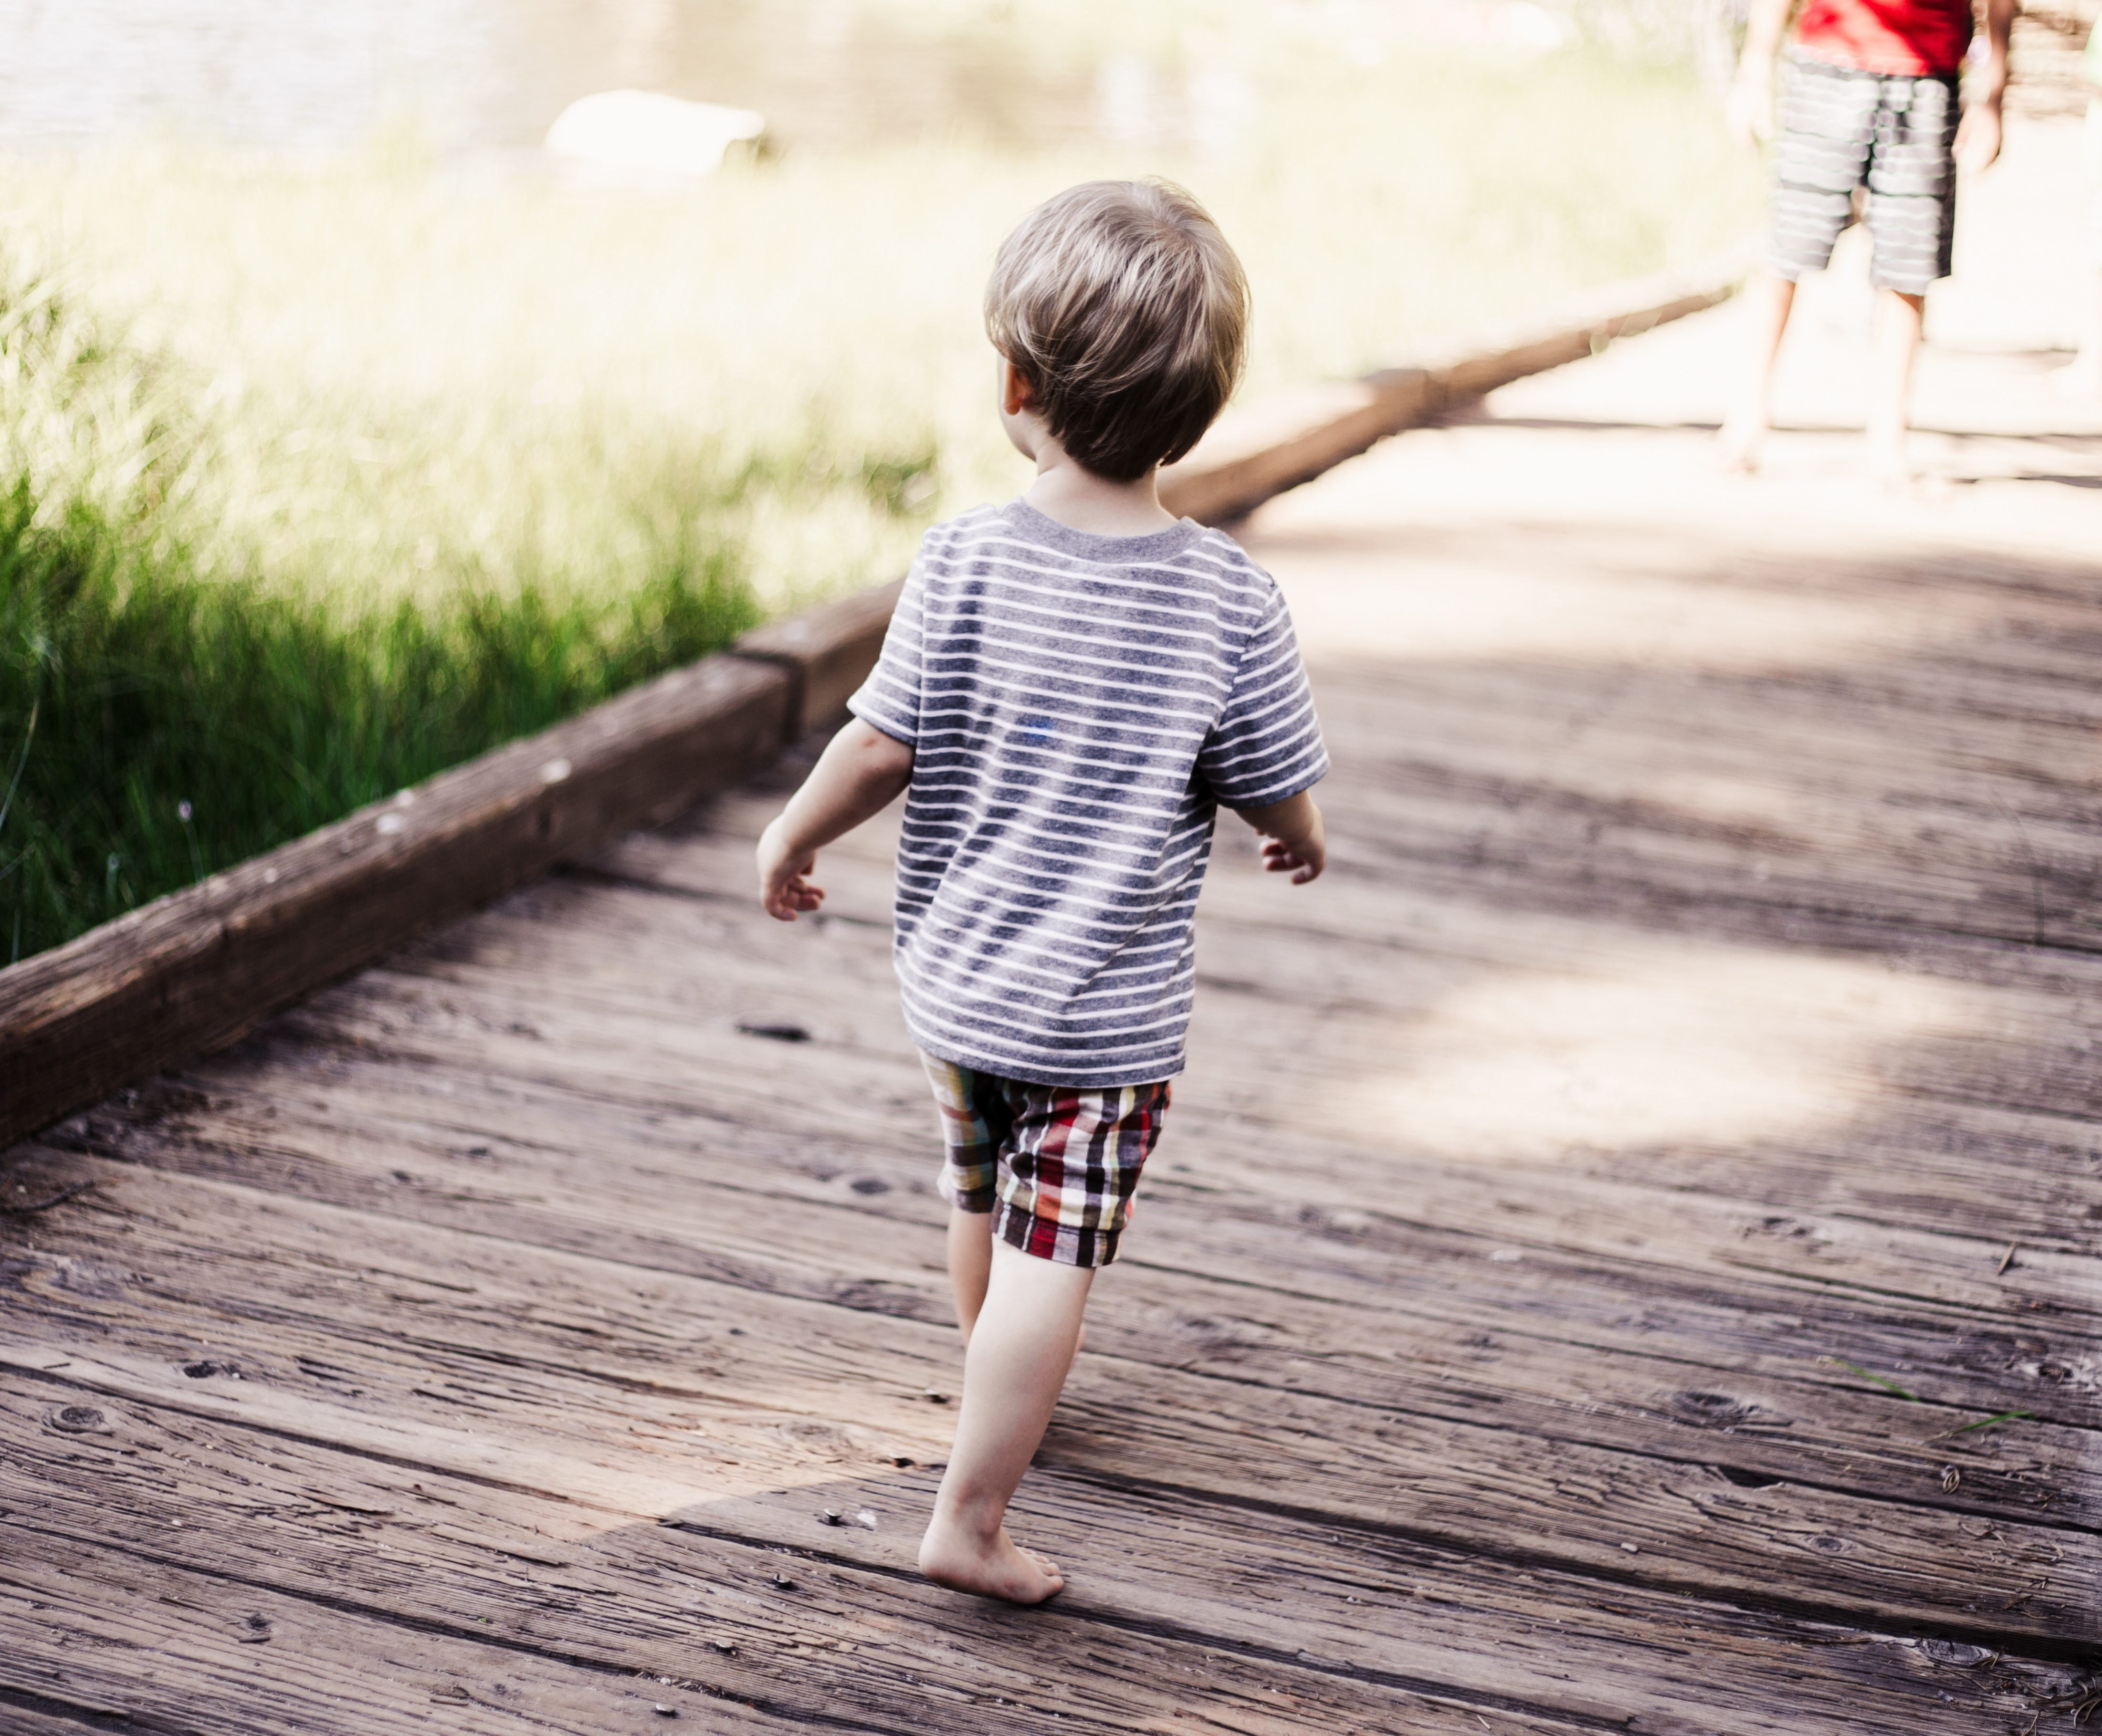 Child walking news